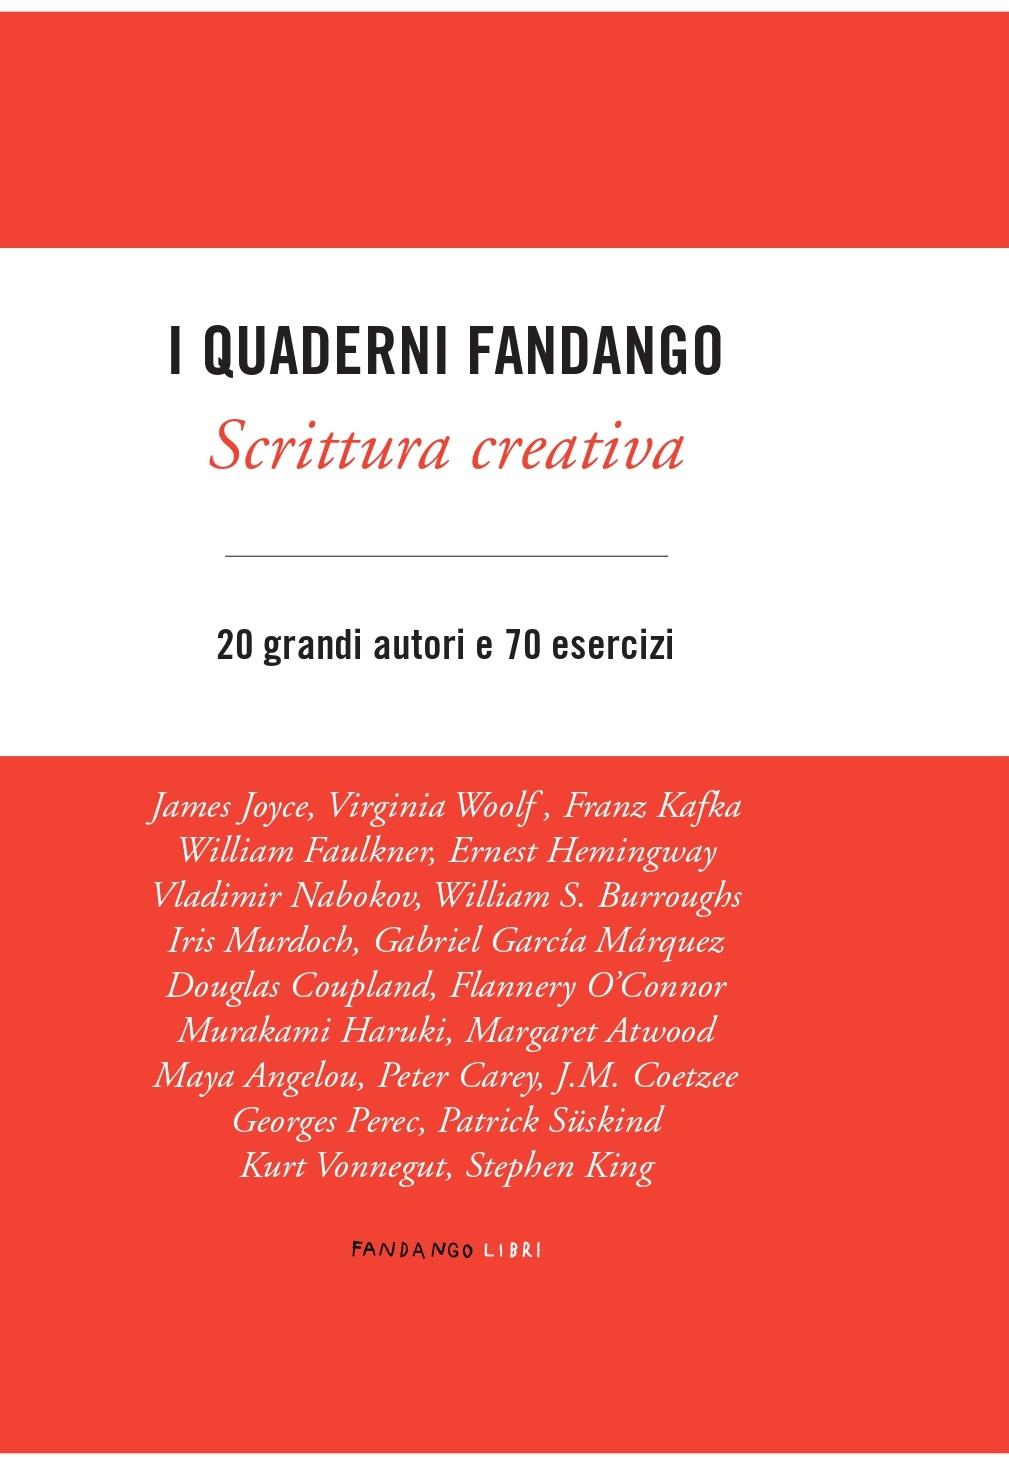 Quaderni Fandango di Scrittura Creativa